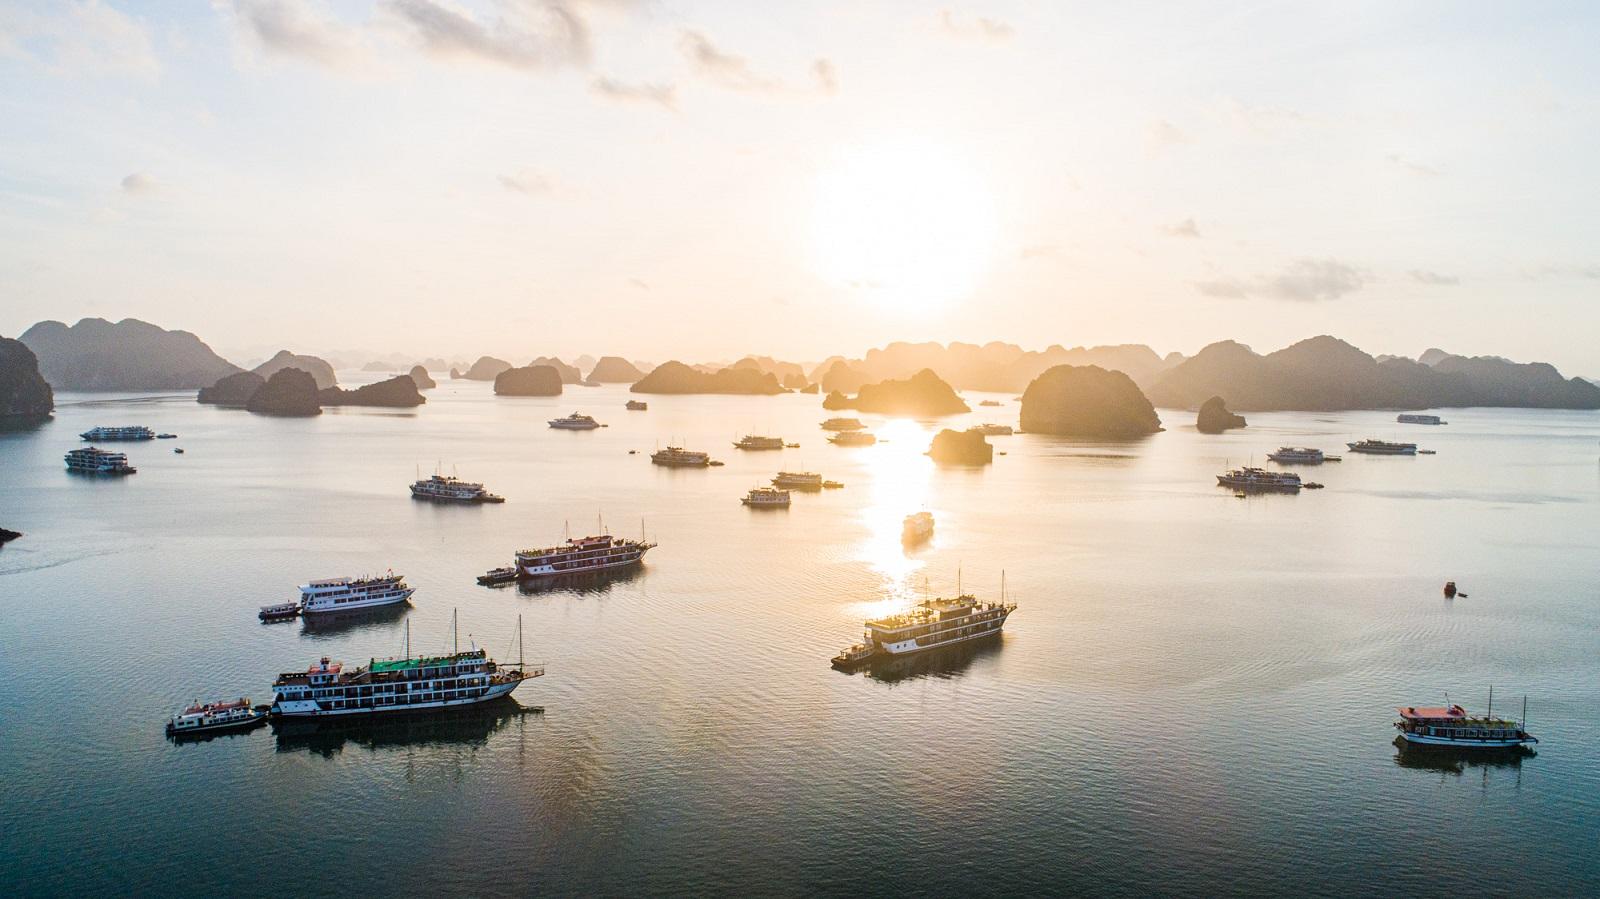 Overnight in Halong Bay cruise